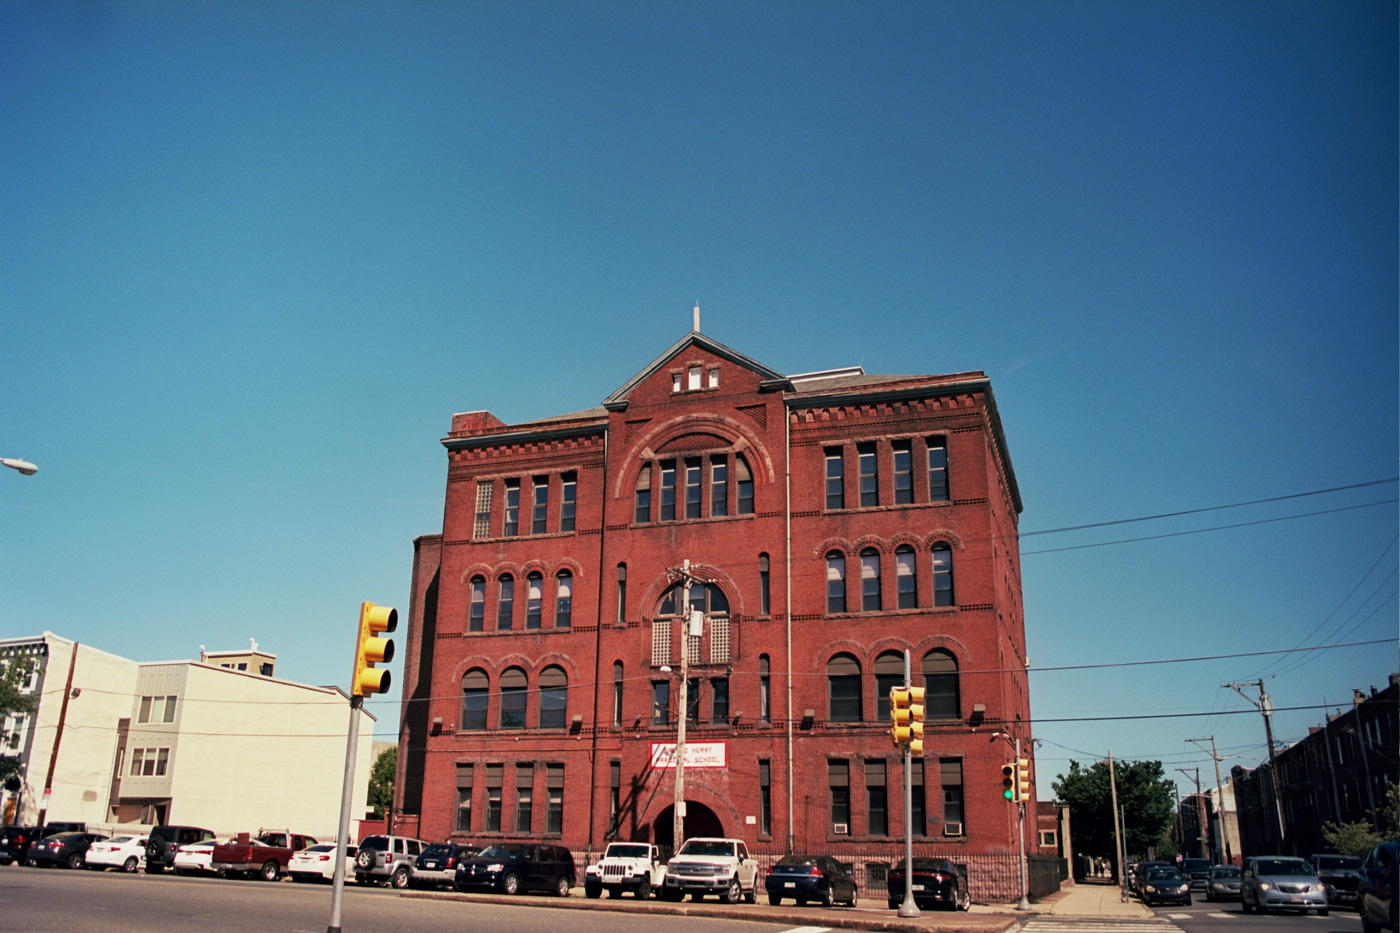 Building along East Moyamensing Ave.